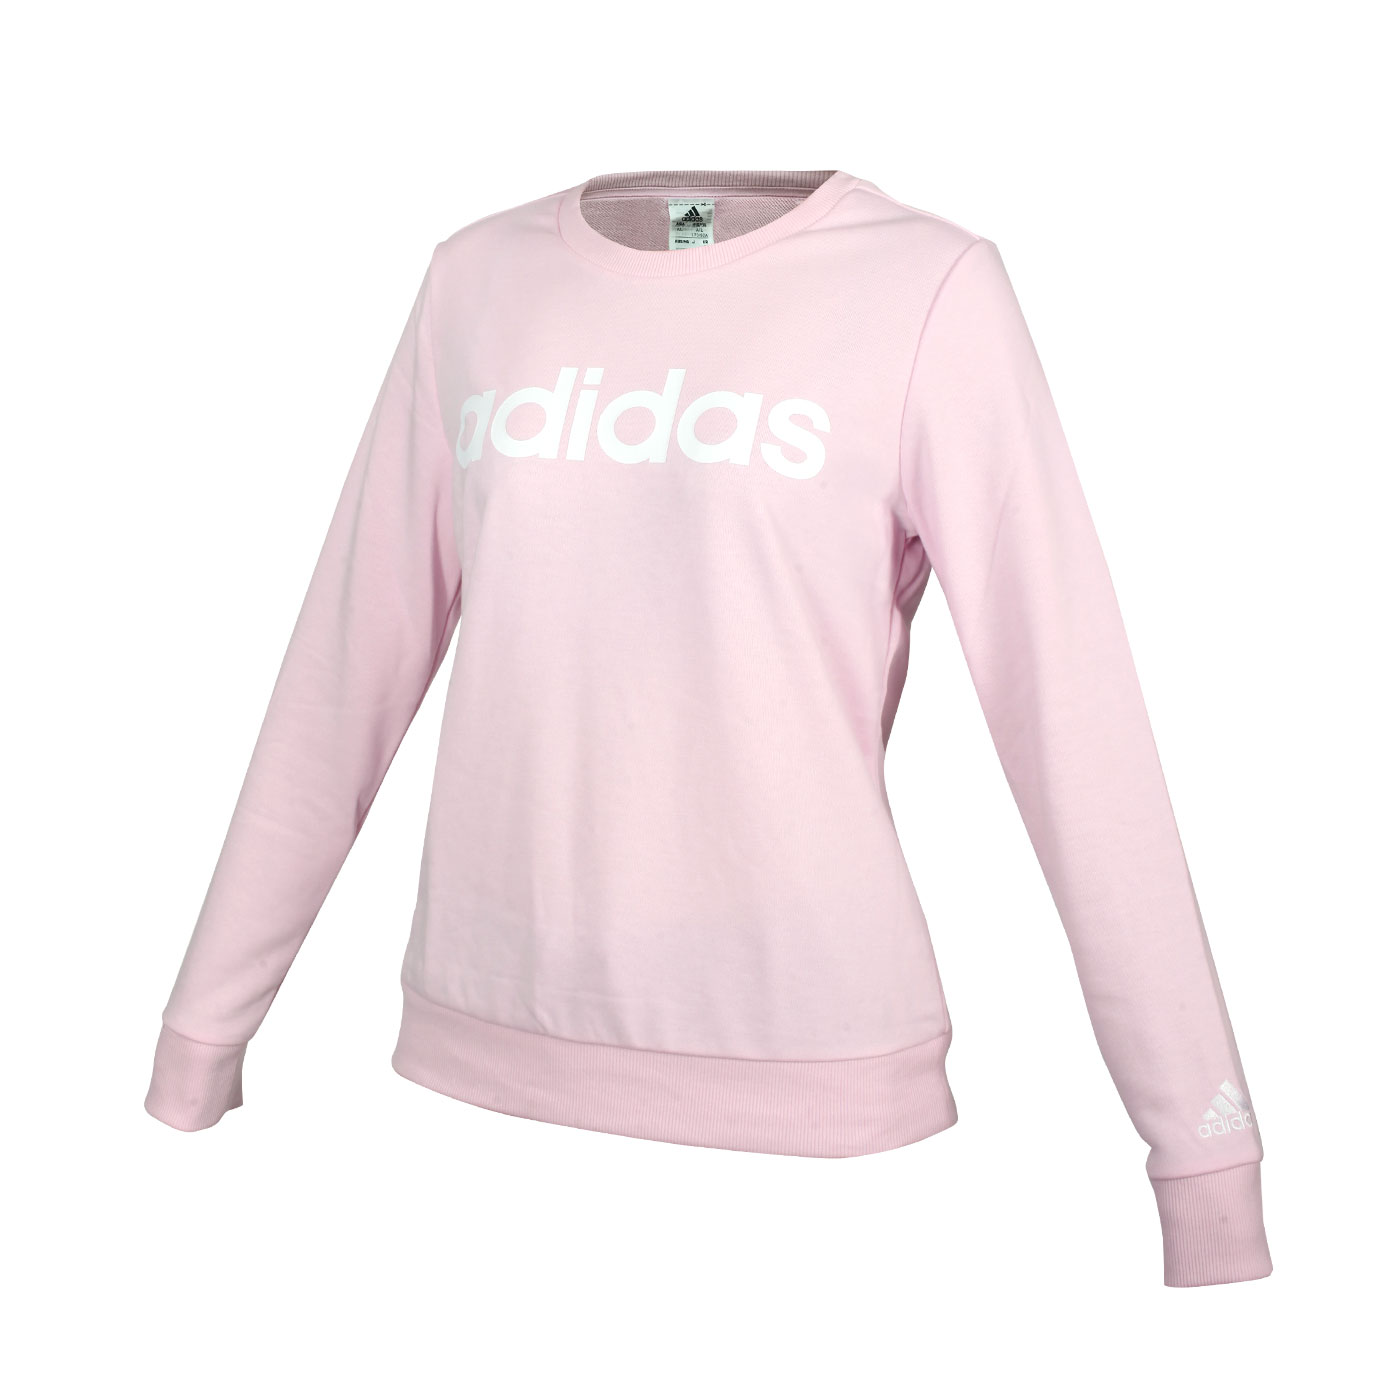 ADIDAS 女款圓領長袖T恤 GL0721 - 粉紅白